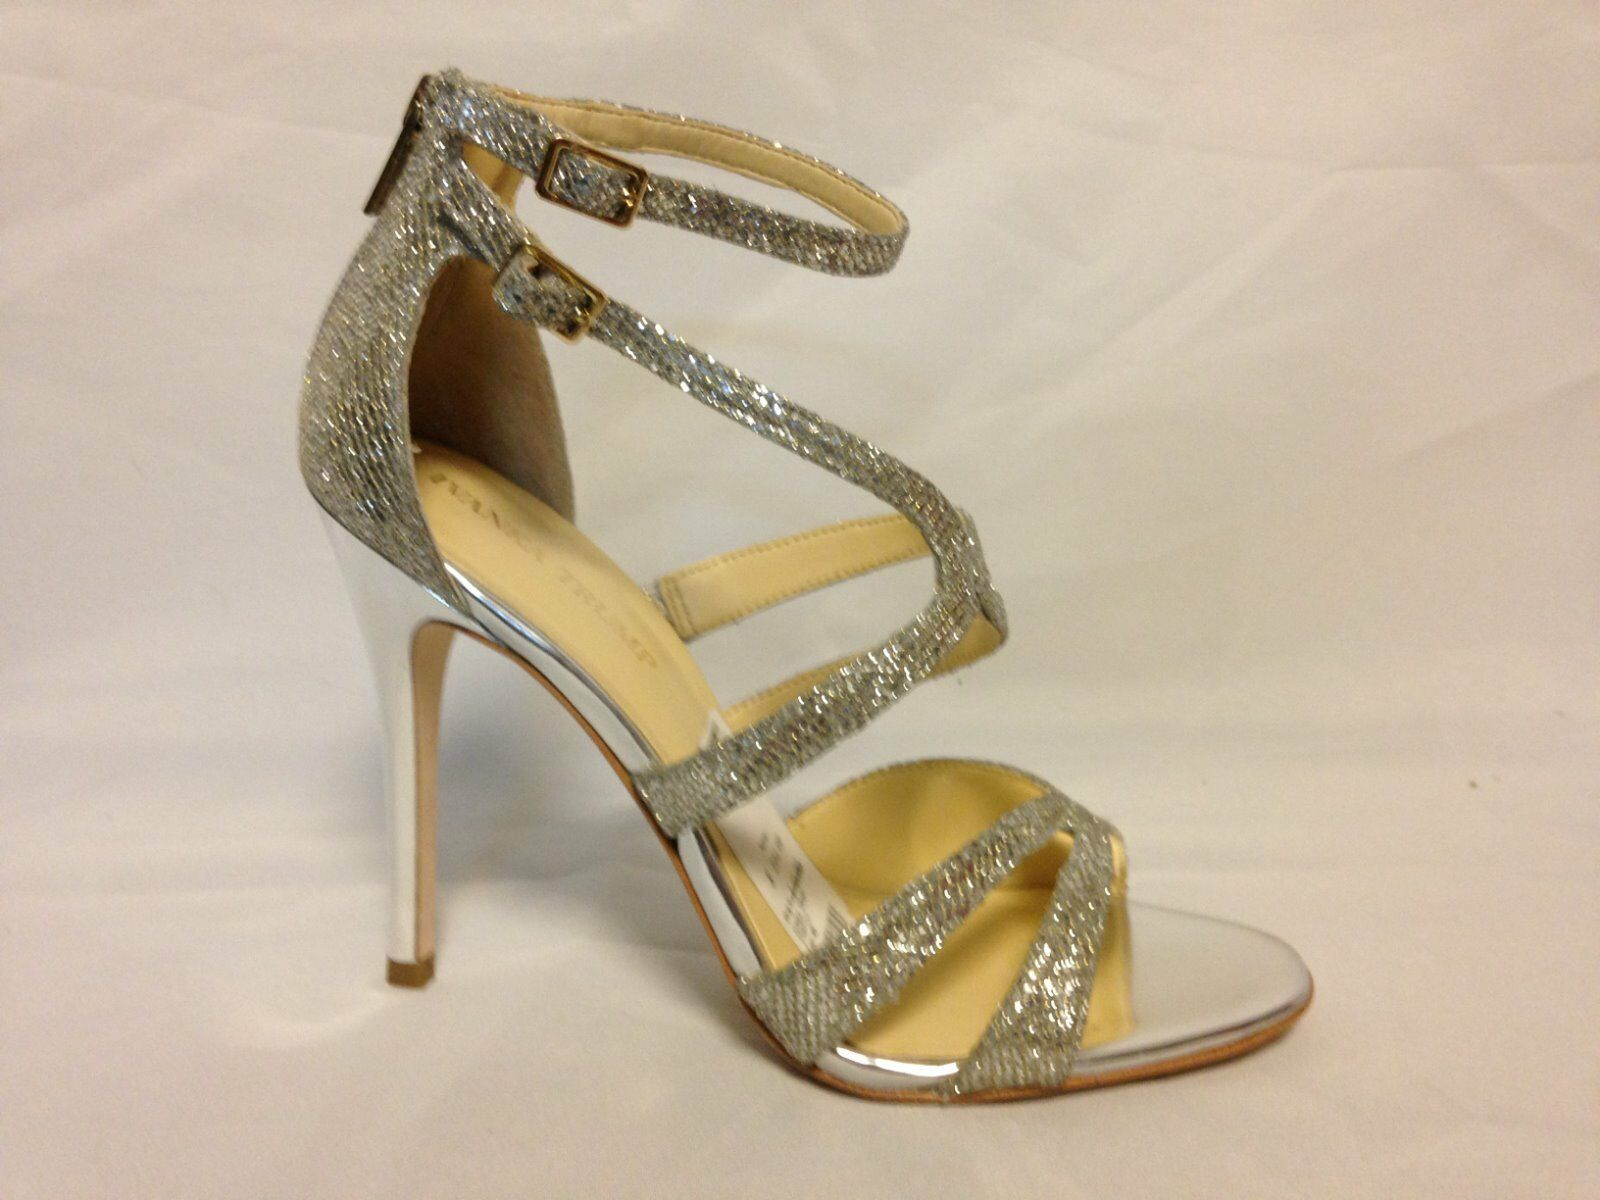 Ivanka Trump Hotis 2 Rhinestone Stiletto Heel Sandale Gold Texture  NEU with Box